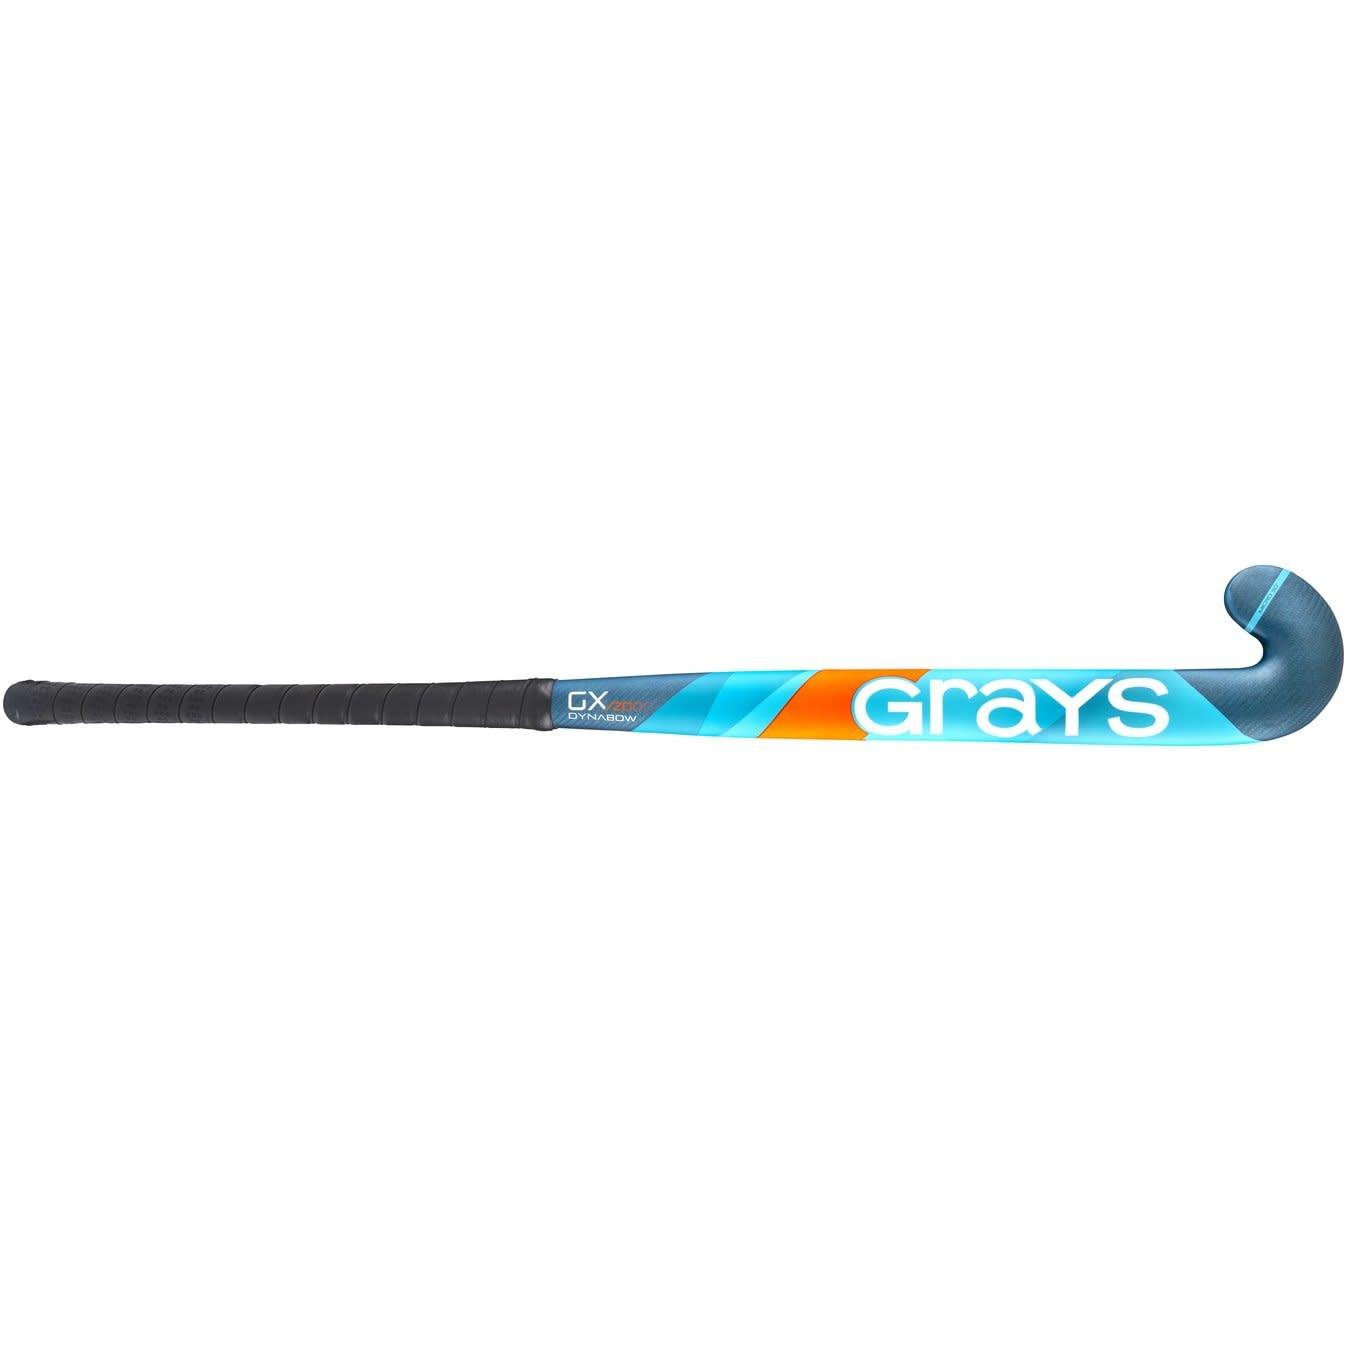 Grays Grays GX 2000 teal junior